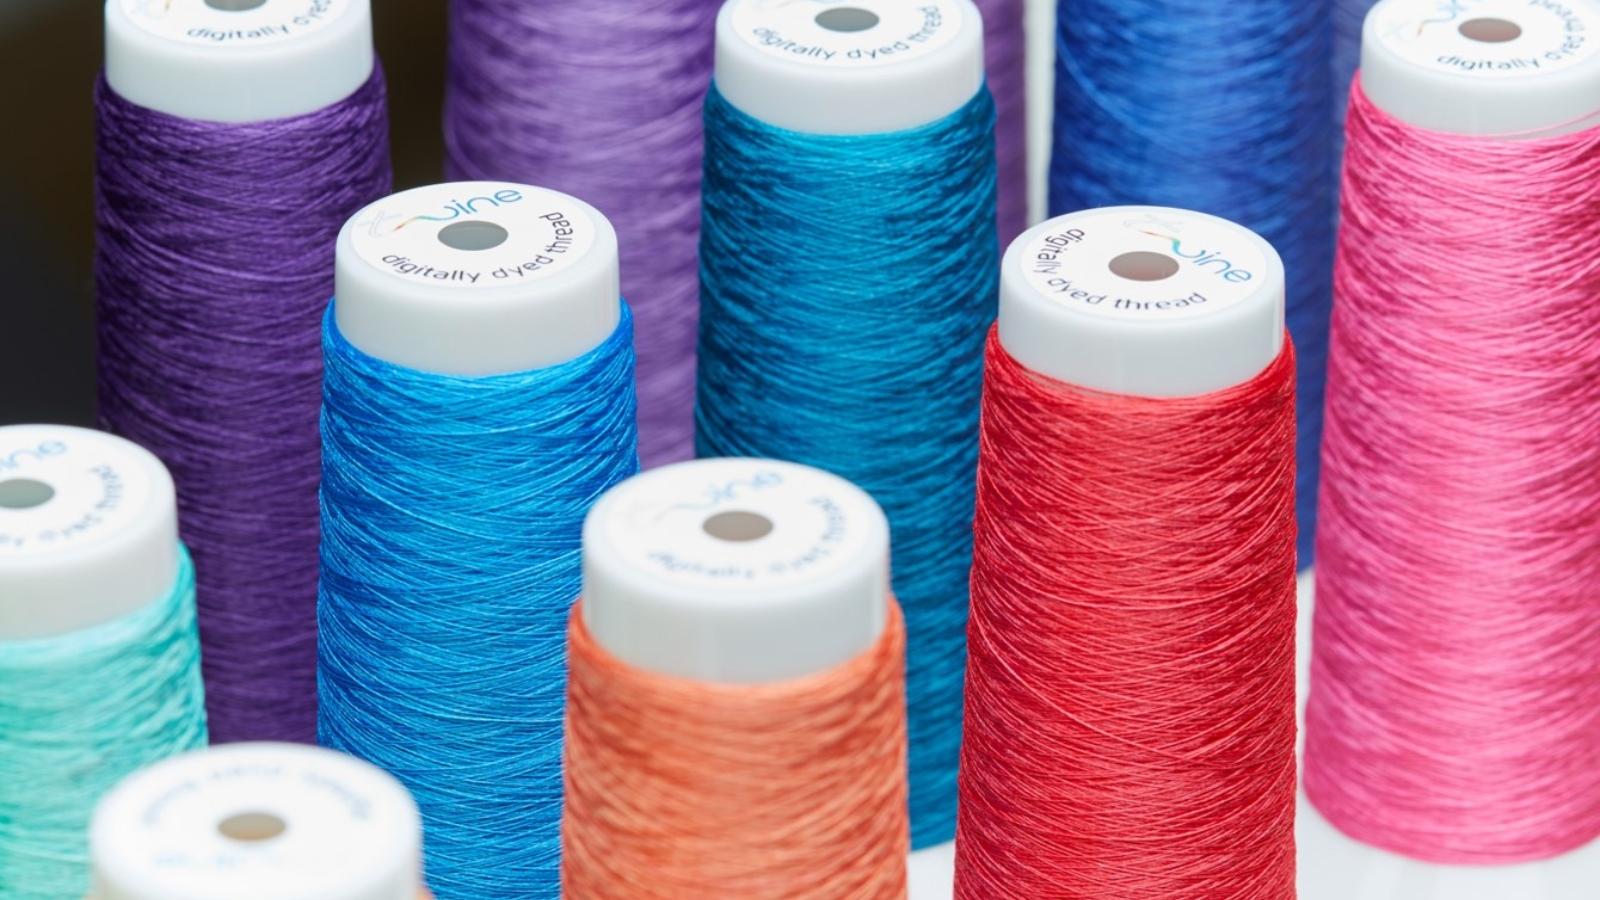 Israeli startup set to shake up the clothing industry